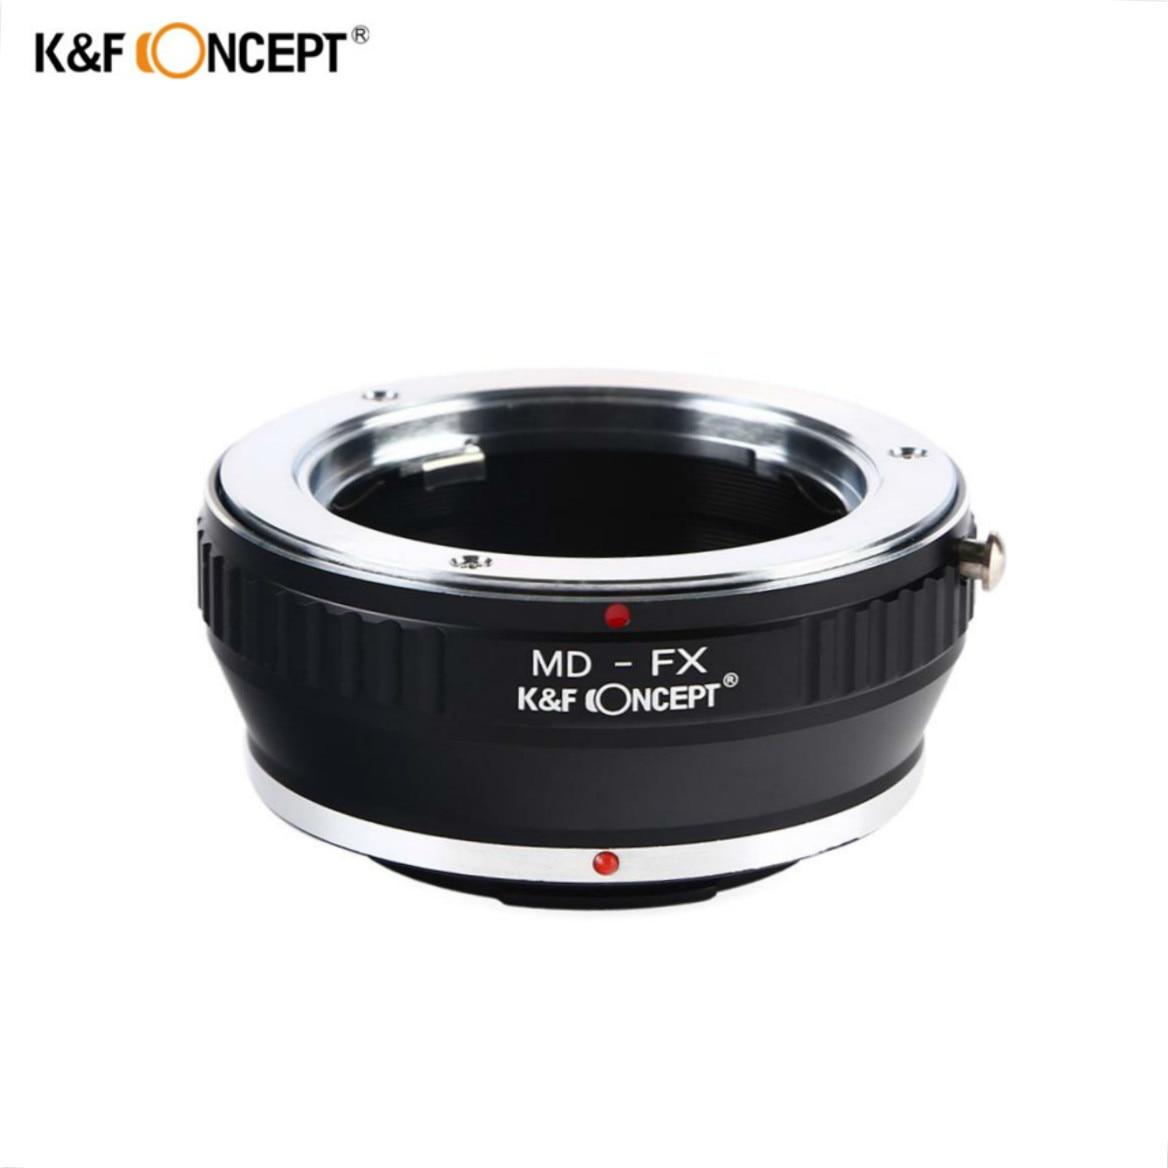 K & F CONCEPT MD-FX lente anillo adaptador para Minolta MD lente de montaje a Fujifilm Fuji X-Pro1 X Pro 1 cámara